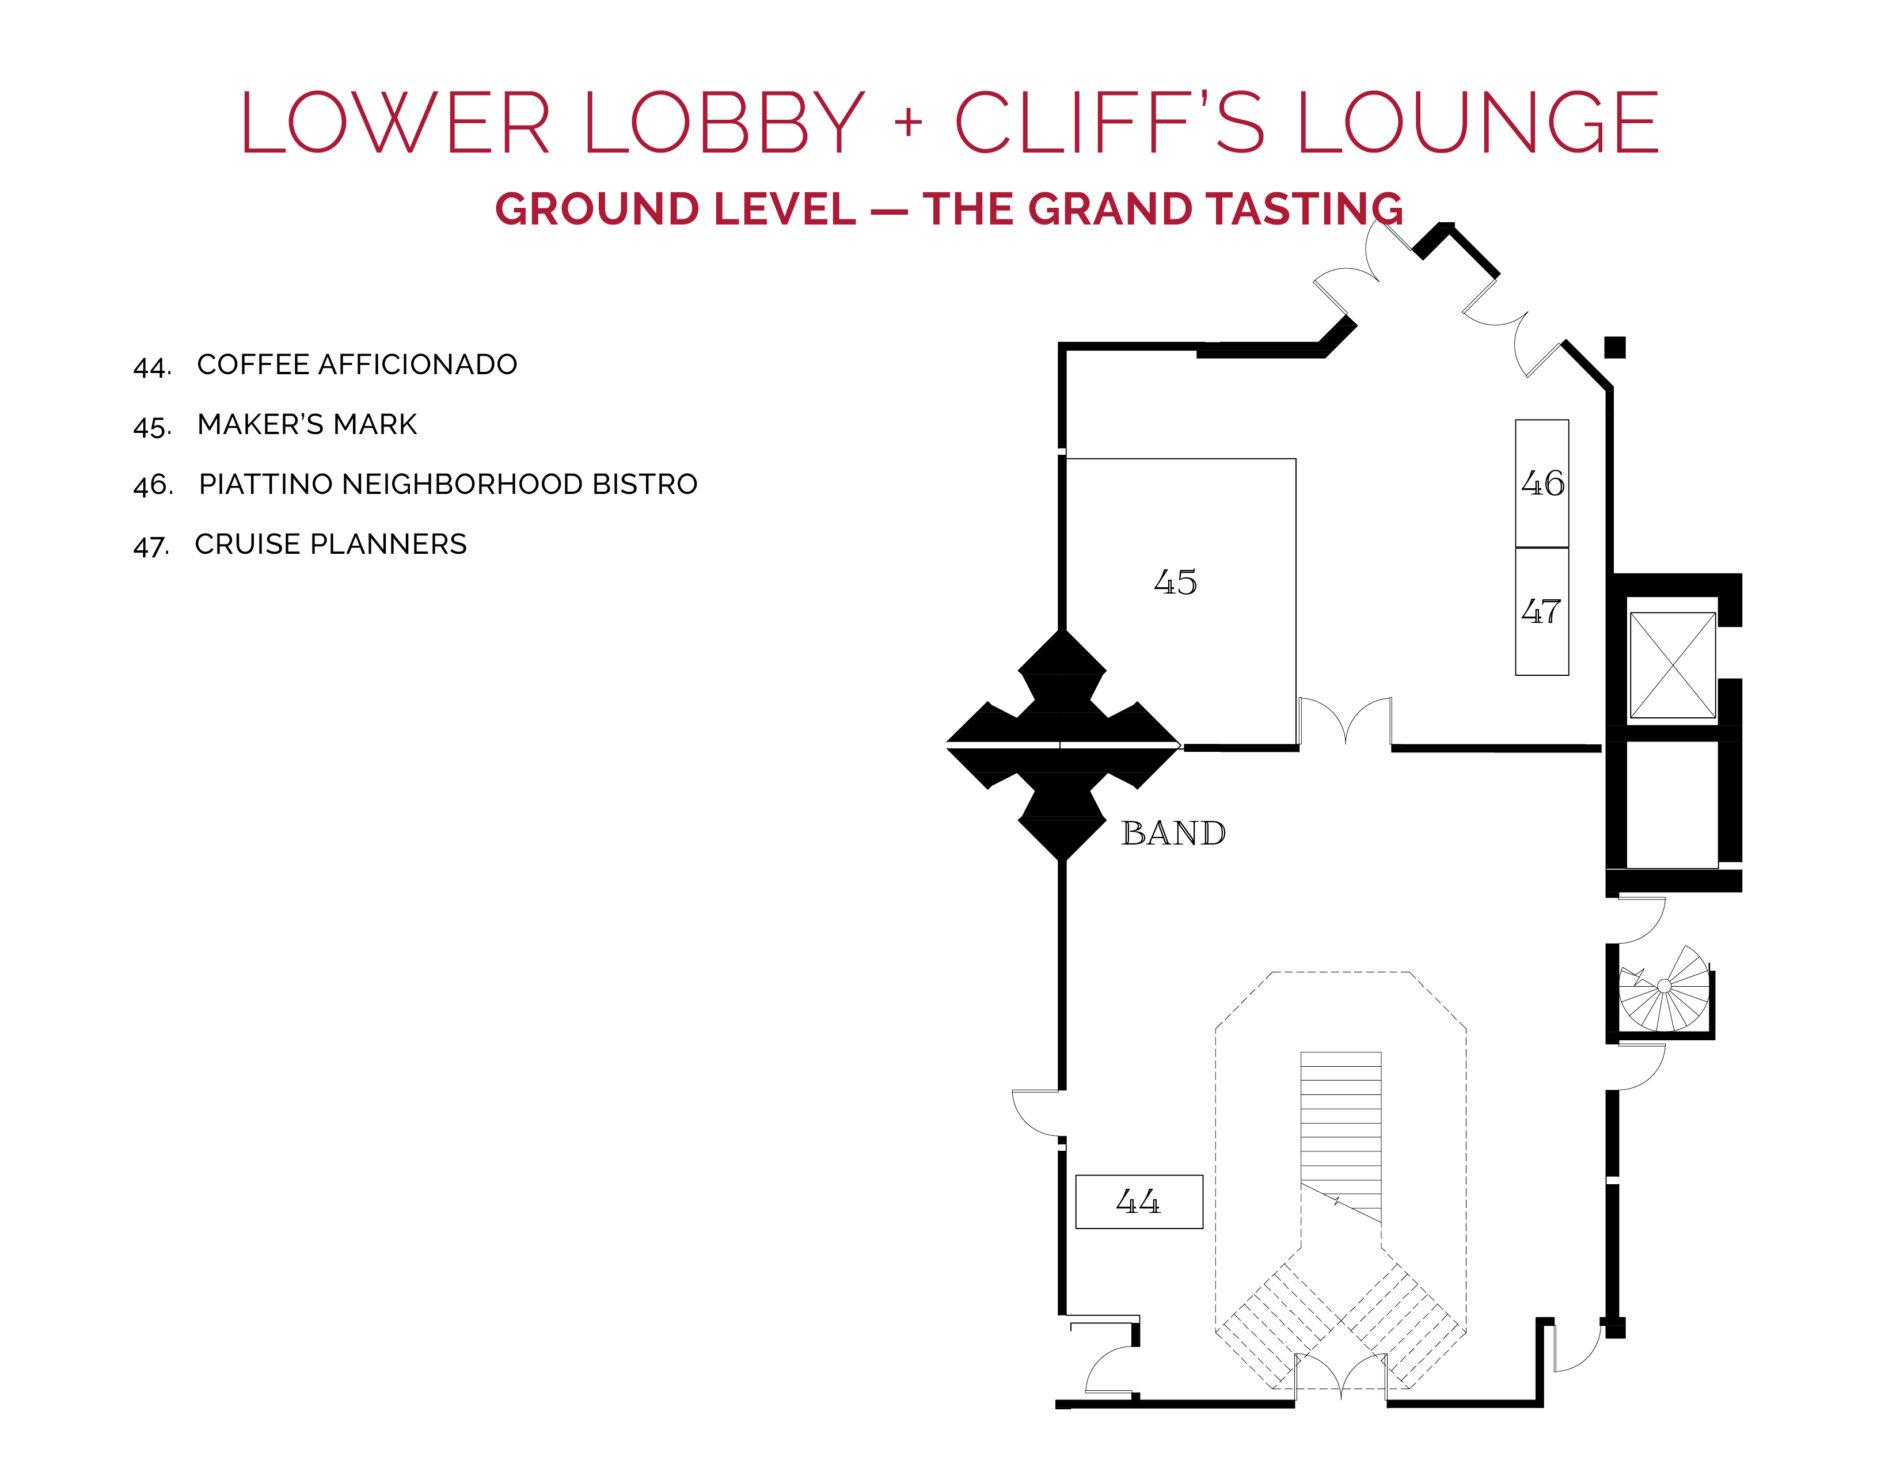 NJWFF Floorplan 2019 Cliffs Lounge